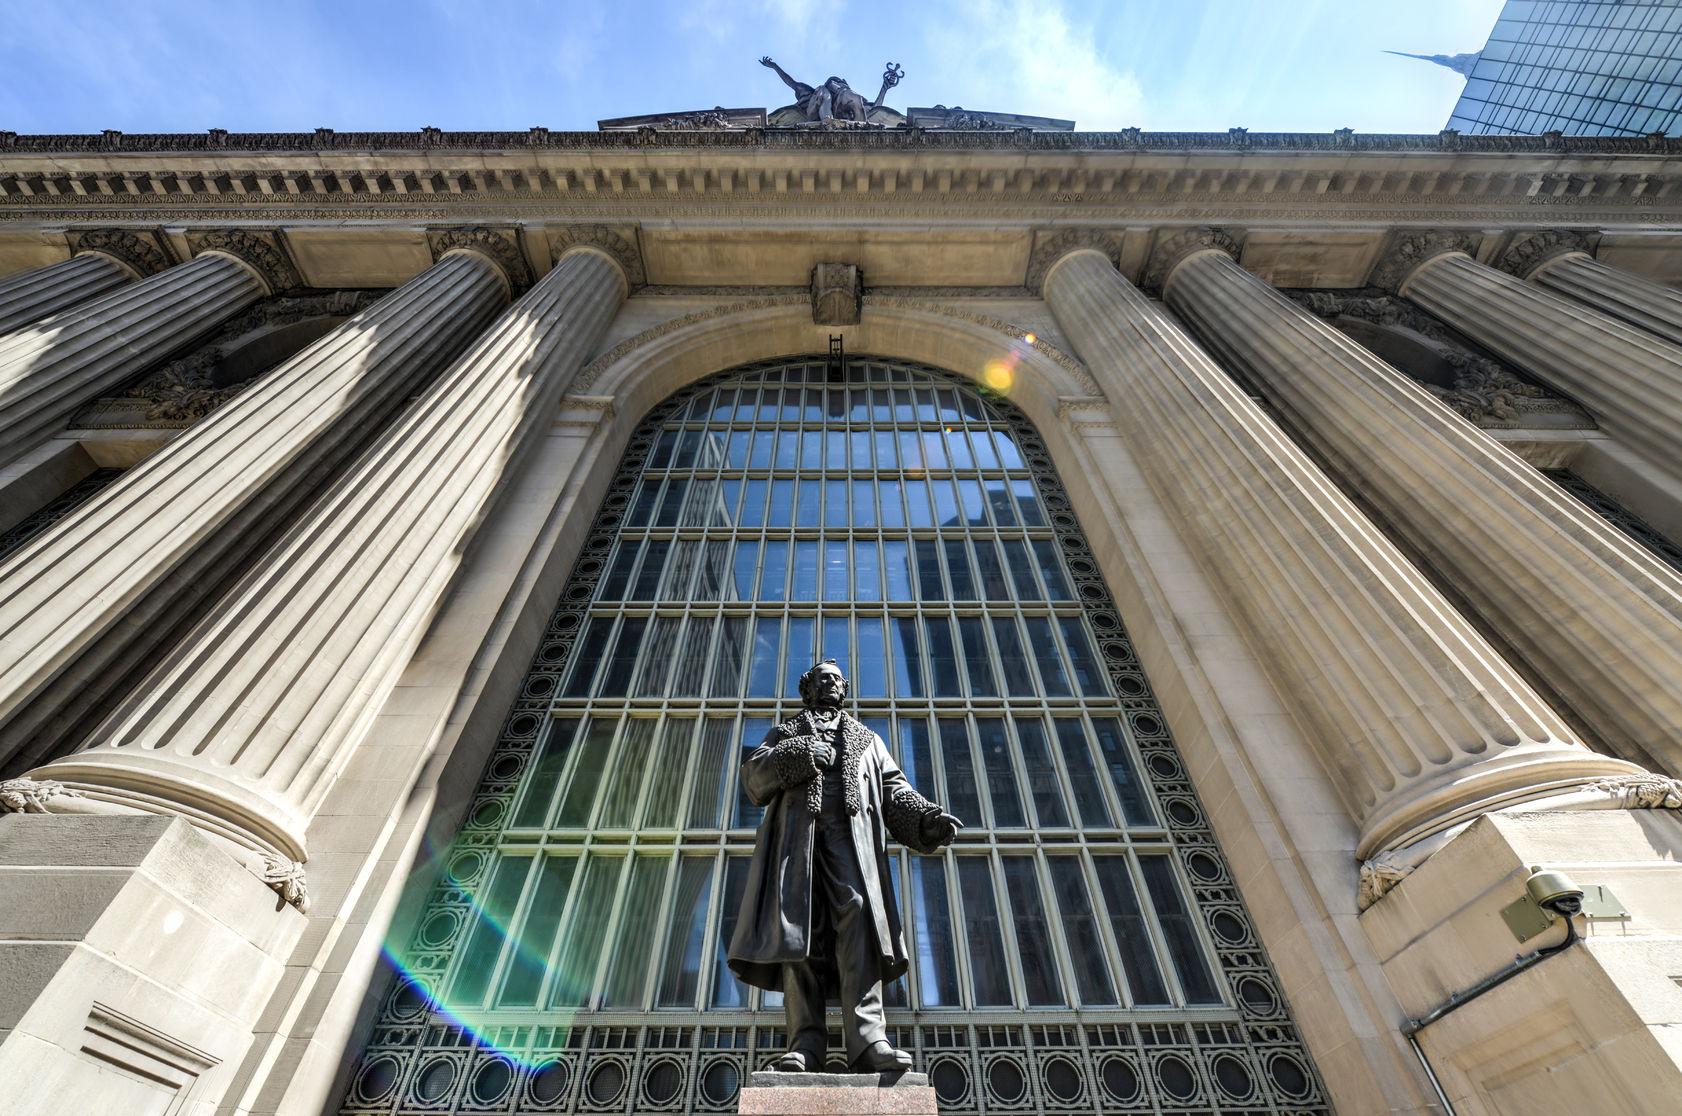 Cornelius Vanderbilt in front of Grand Central Station. Image Copyright :Felix Lipov